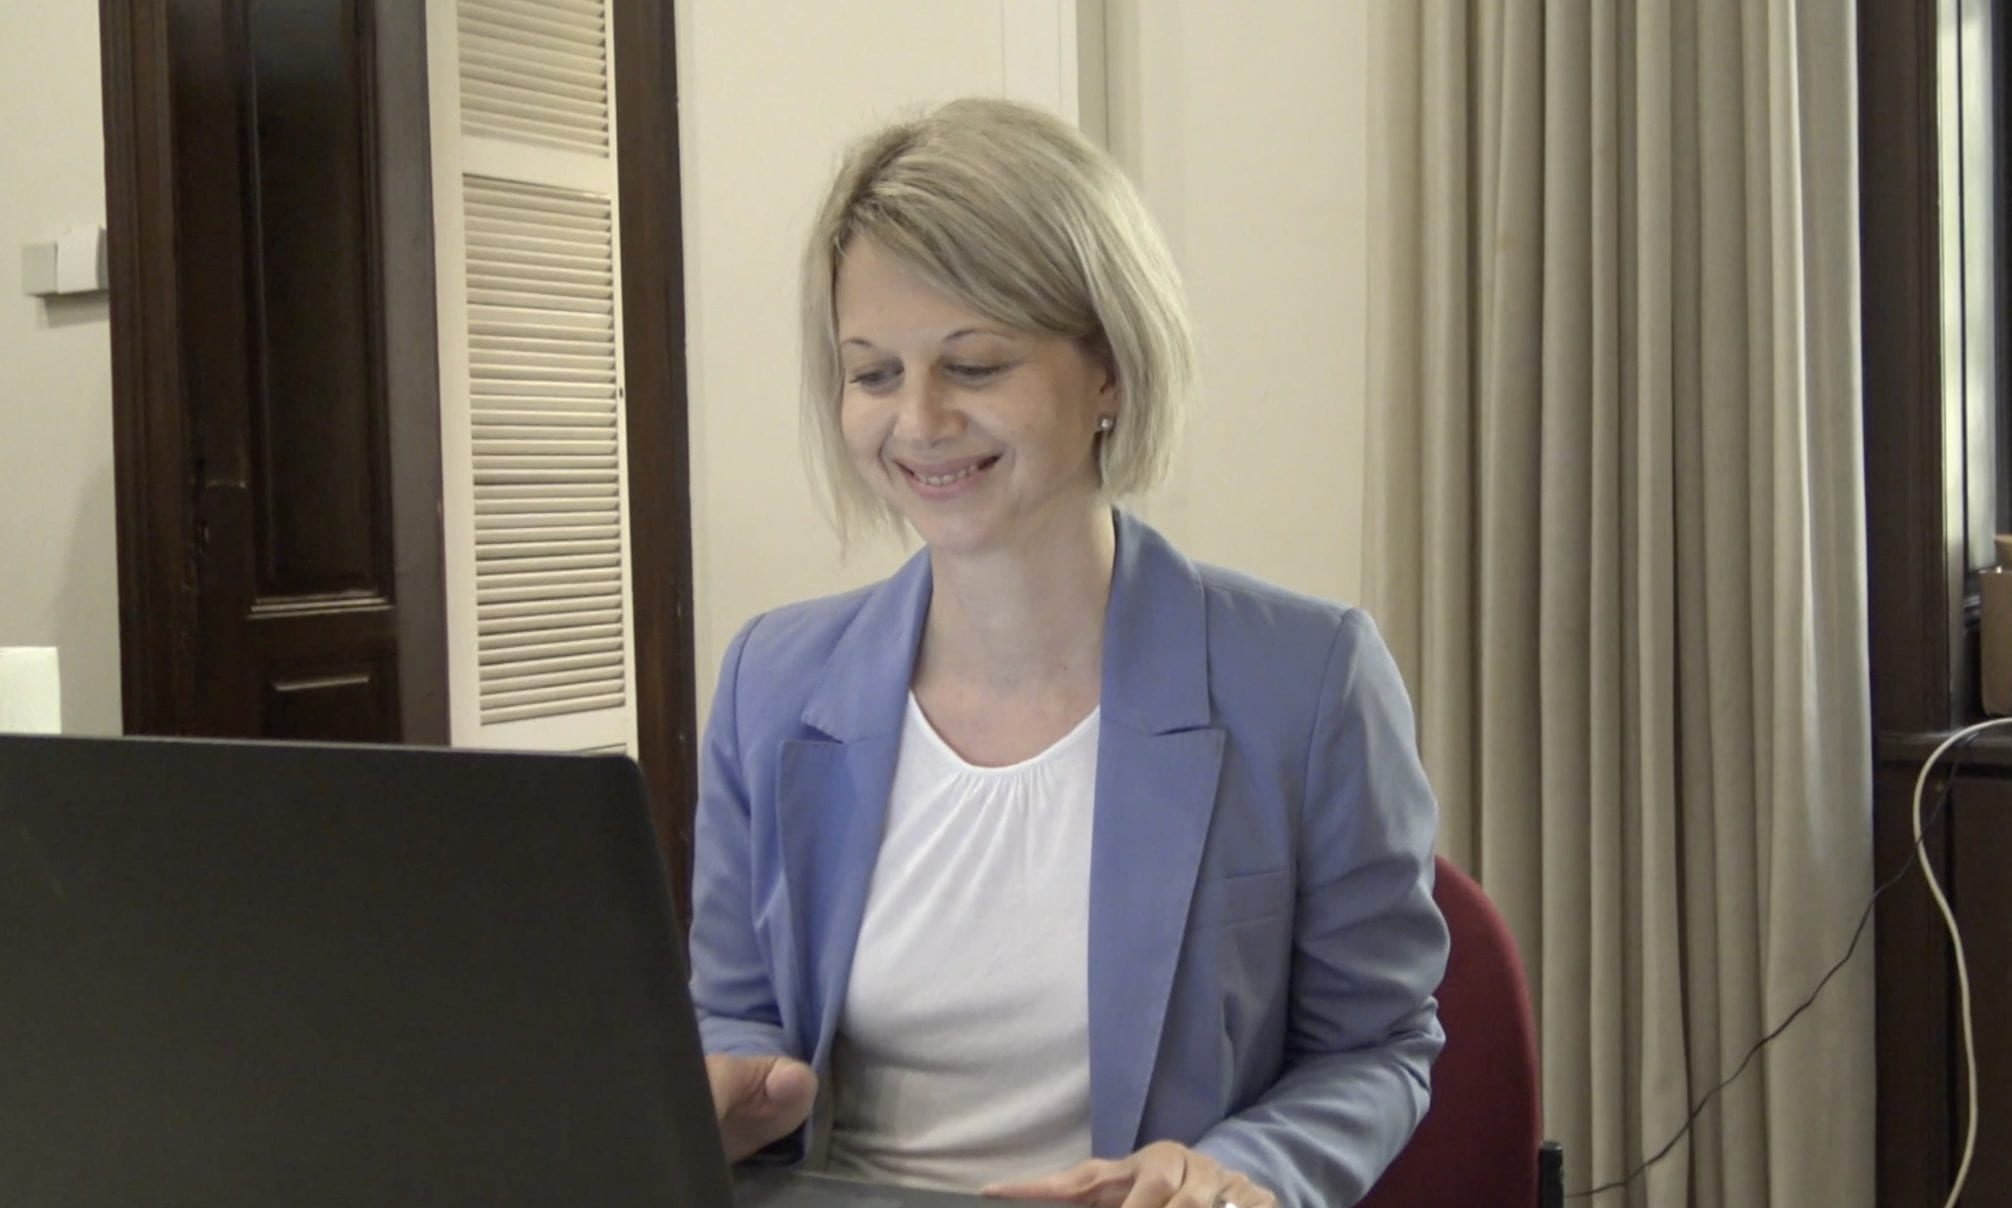 Birgit Pühringer